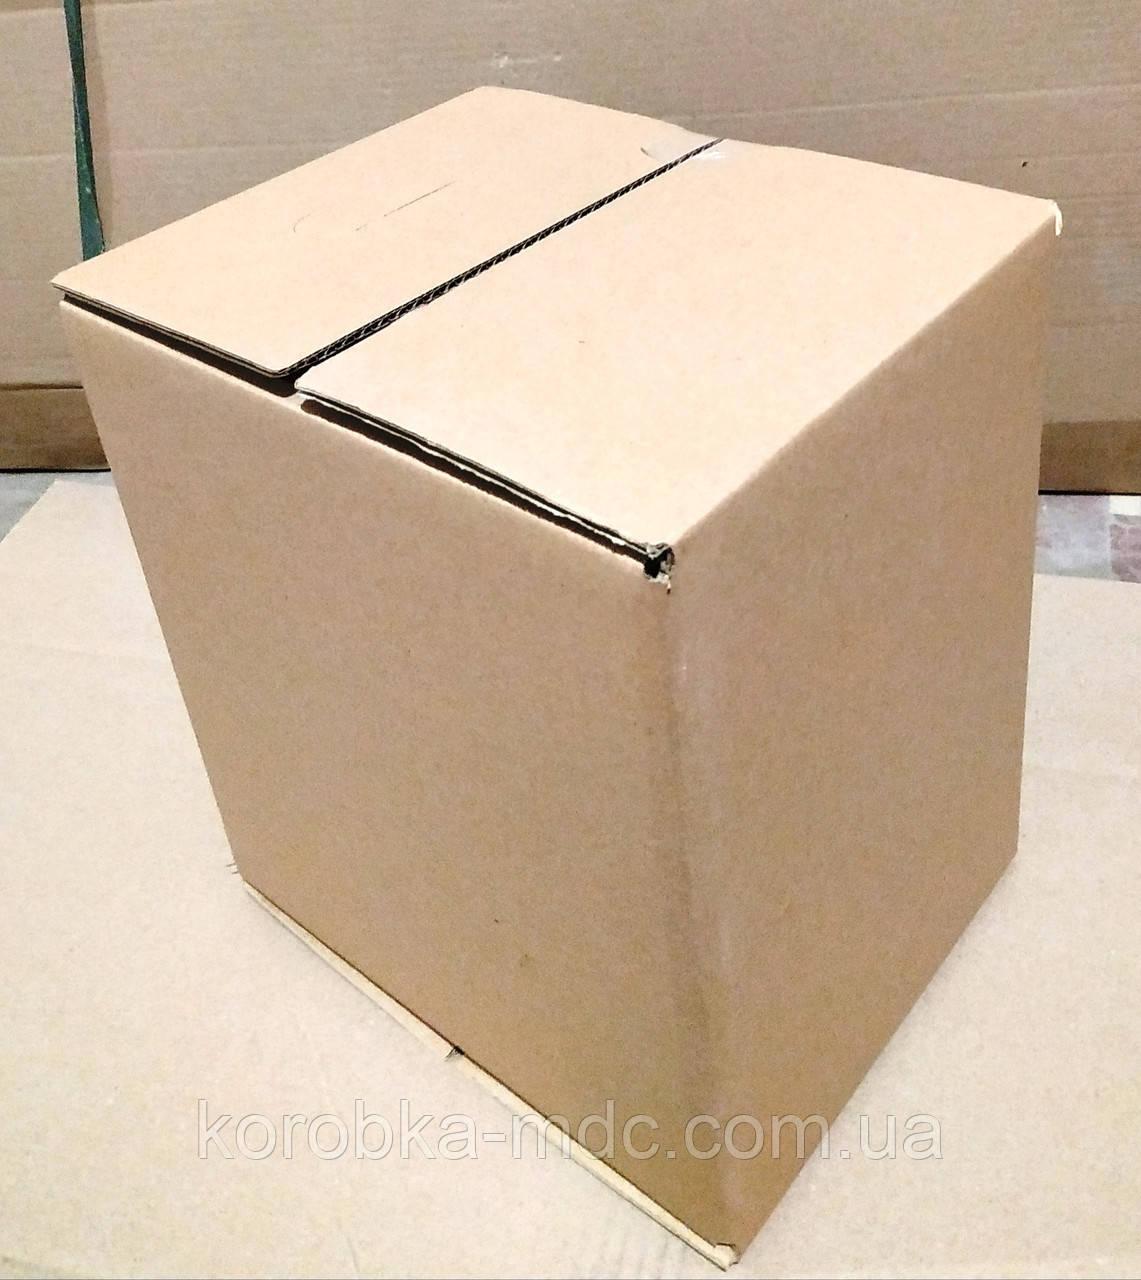 Коробка 20 л Бег ин бокс (сложная висечка)